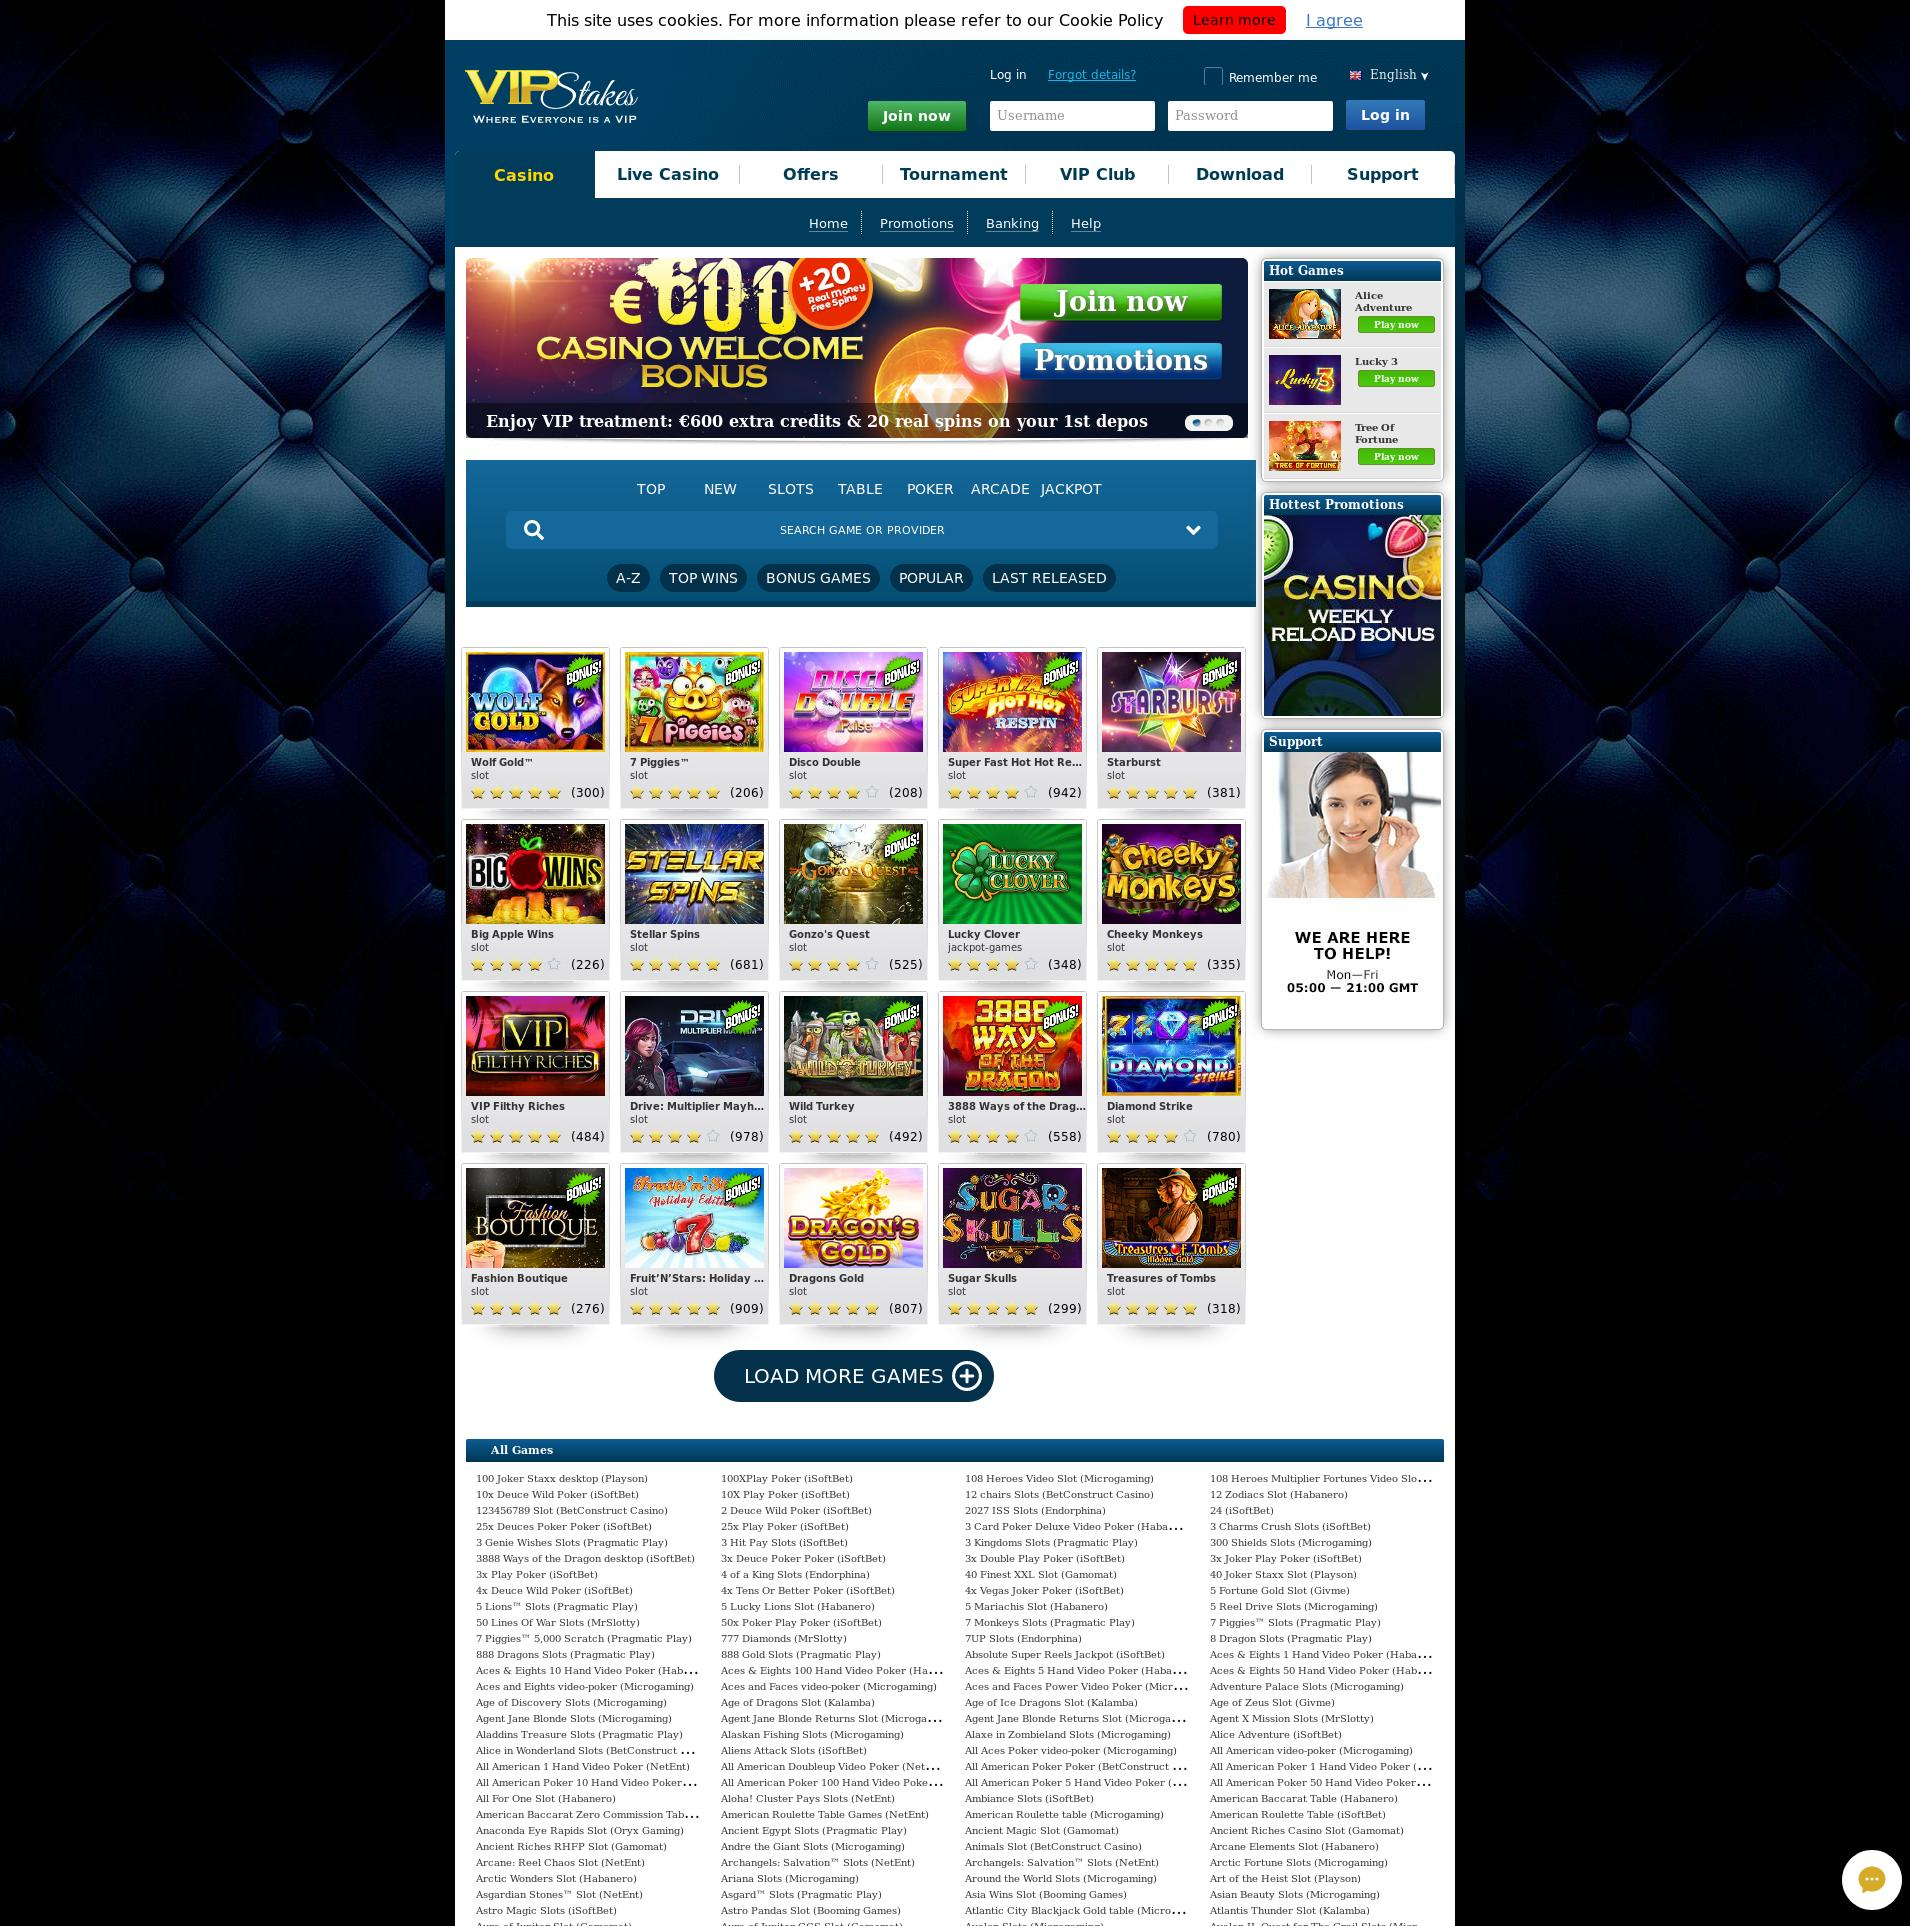 Casino screen Lobby 2019-08-25 for Finland